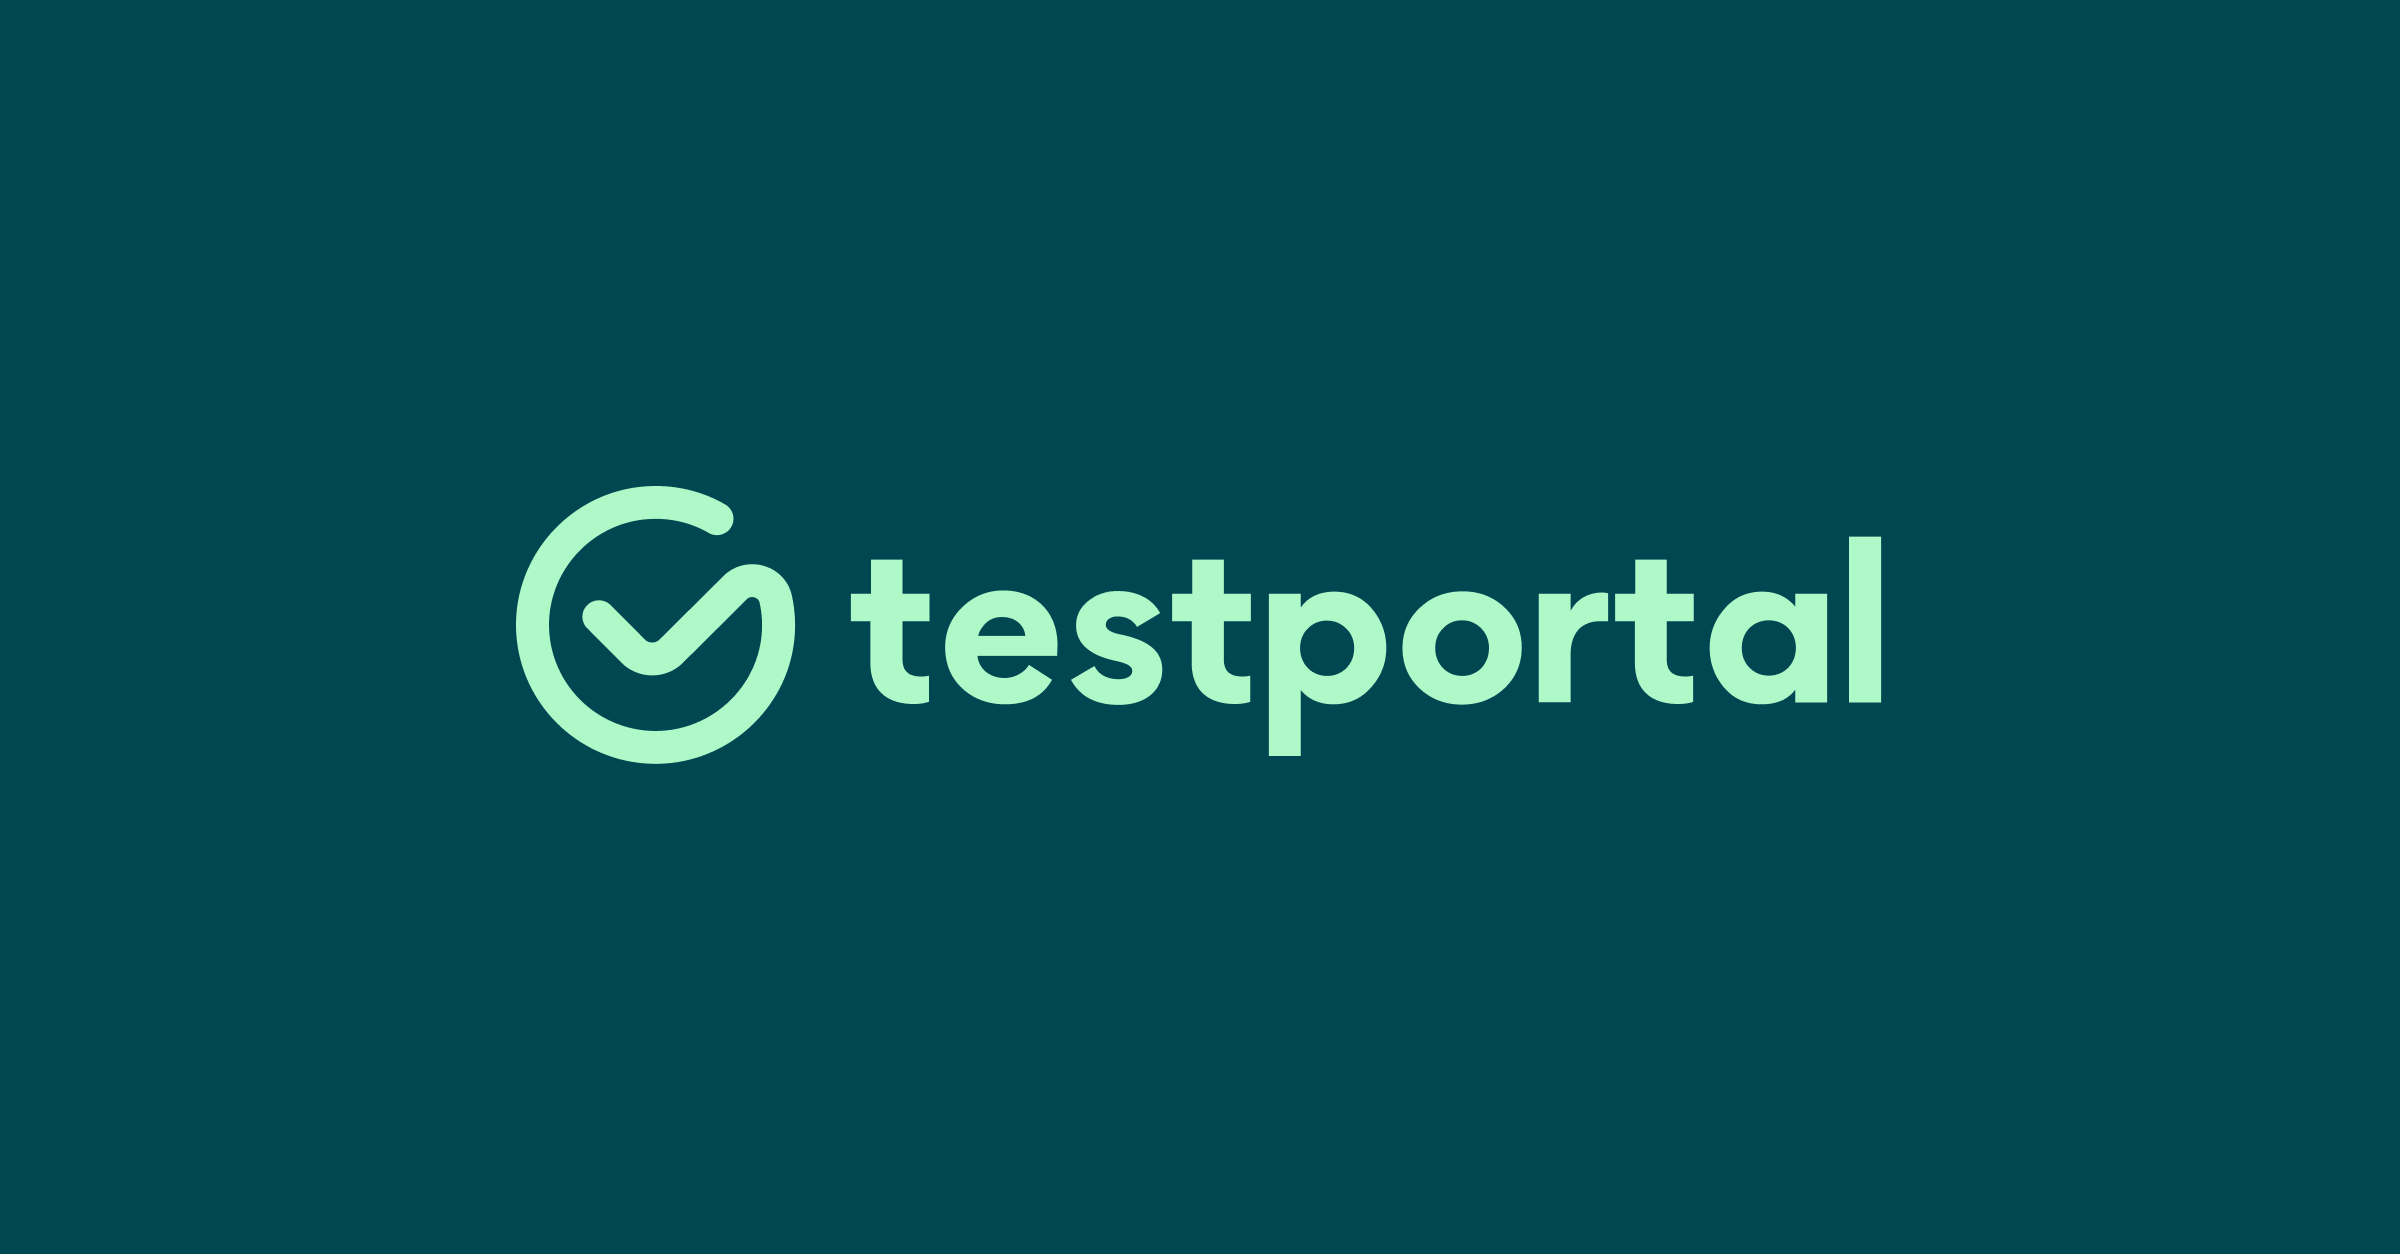 Testportal Logowanie